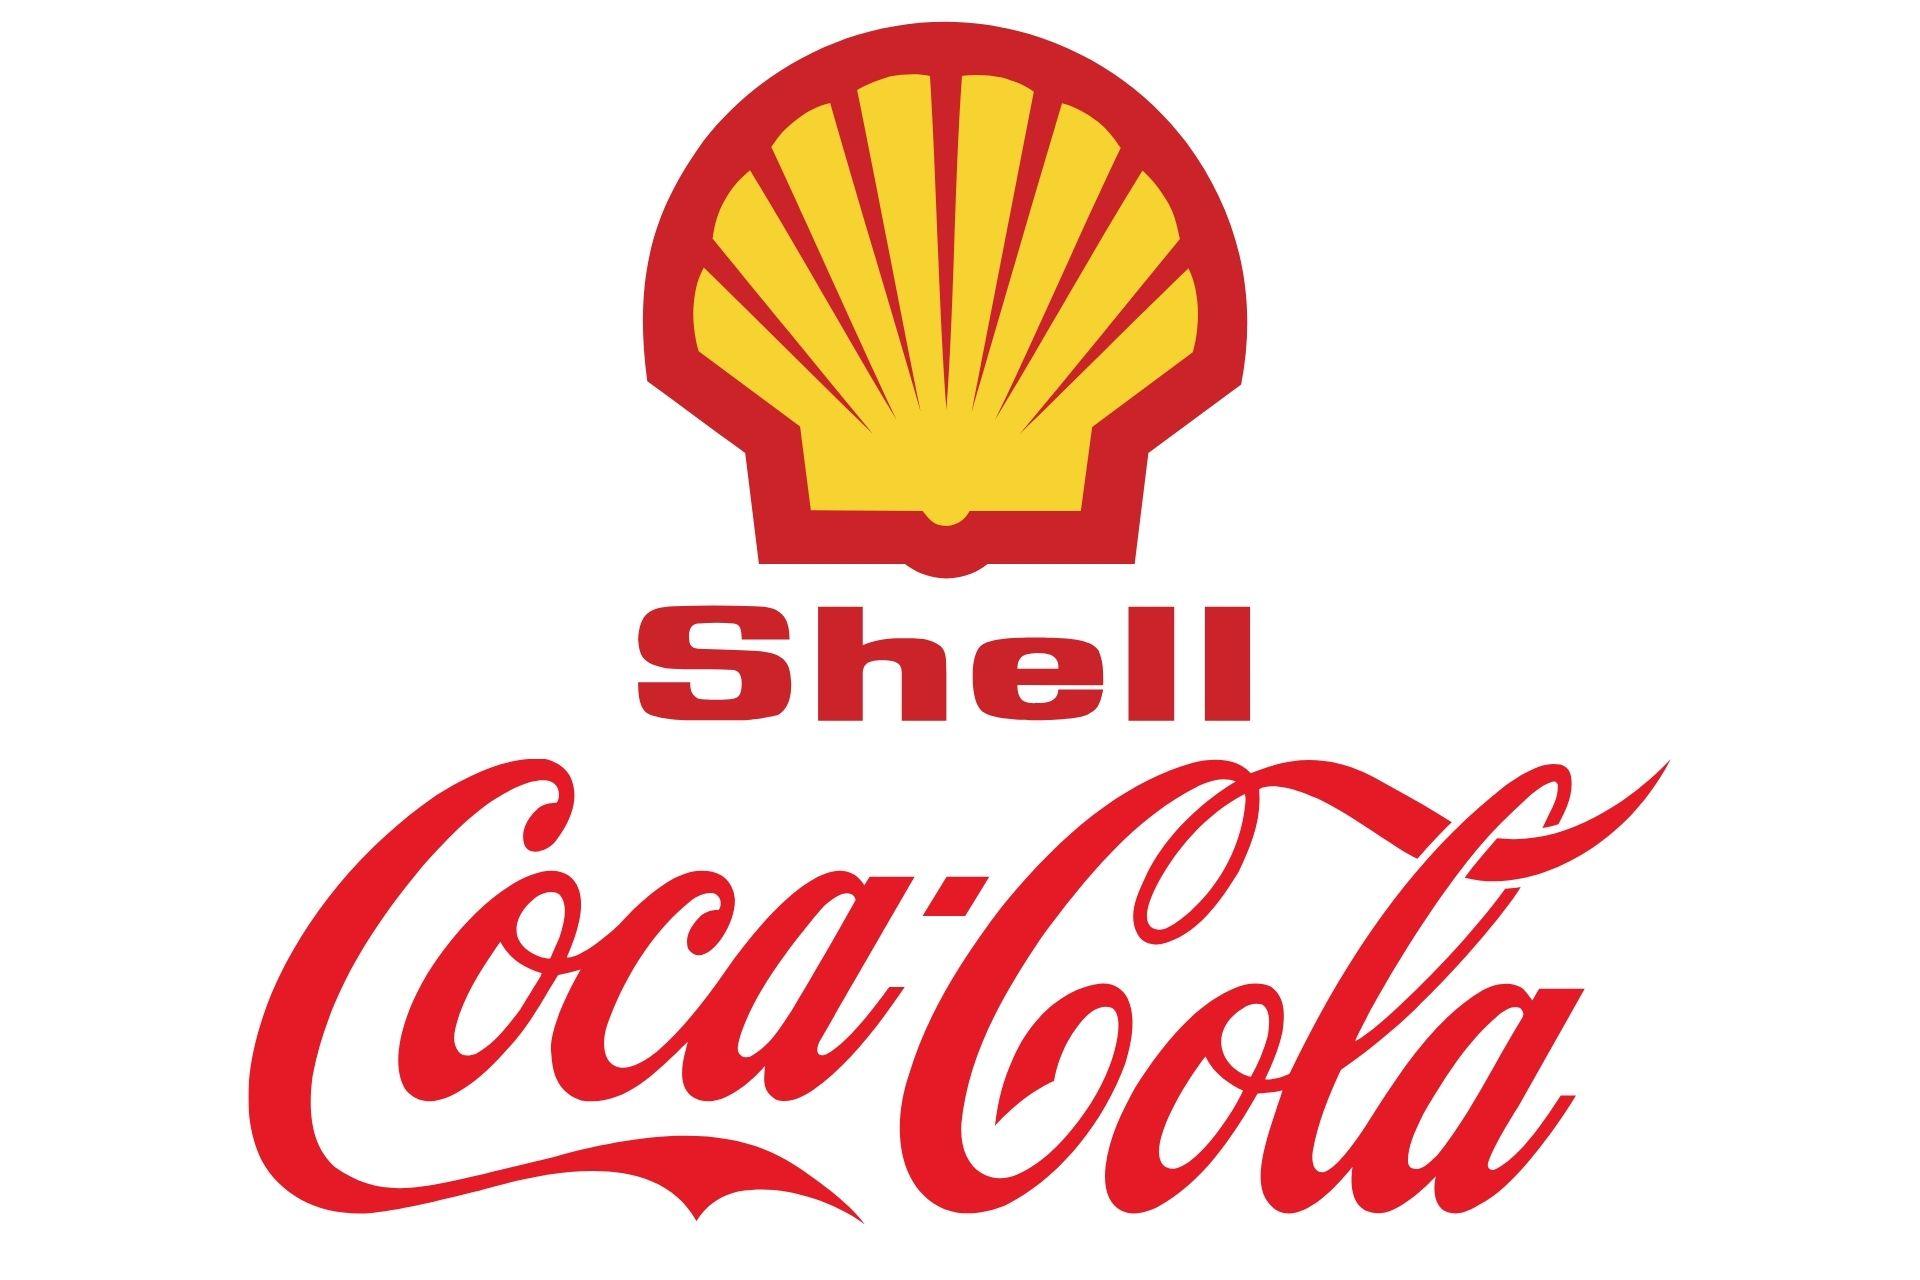 Corporate Logo Vs. Product Logo Design